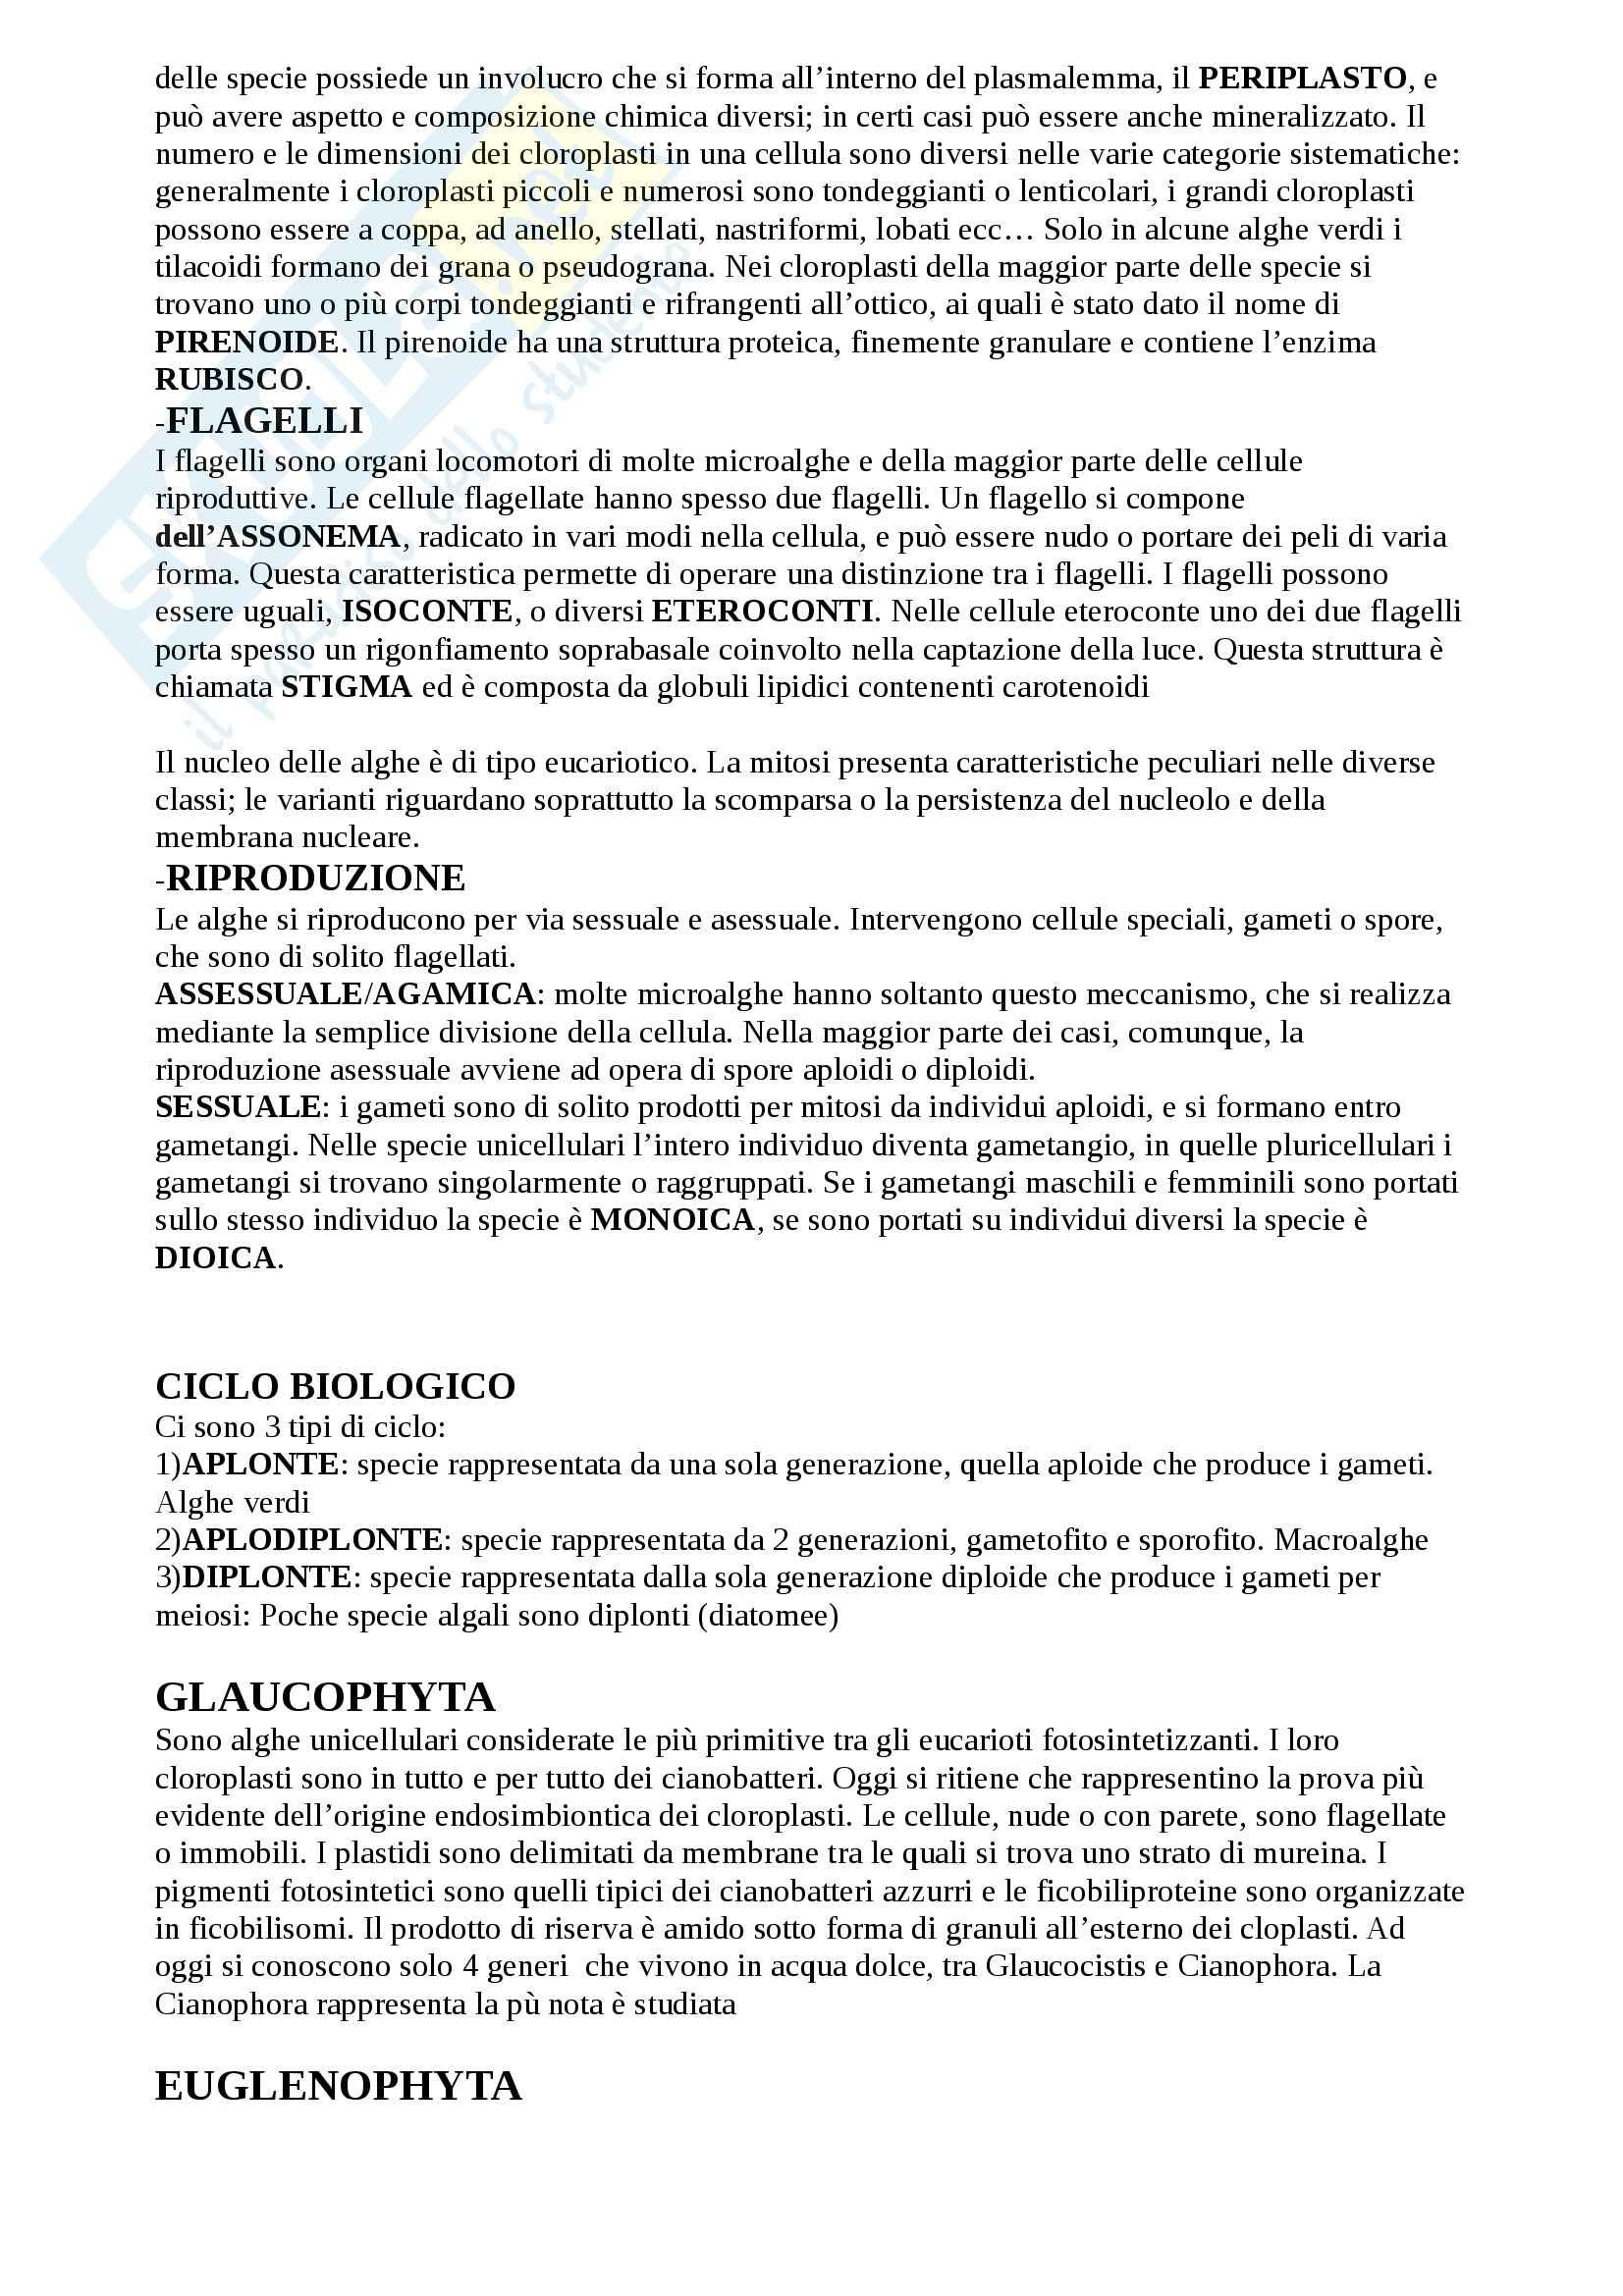 Riassunto esame Botanica Generale, prof. Papini Pag. 6